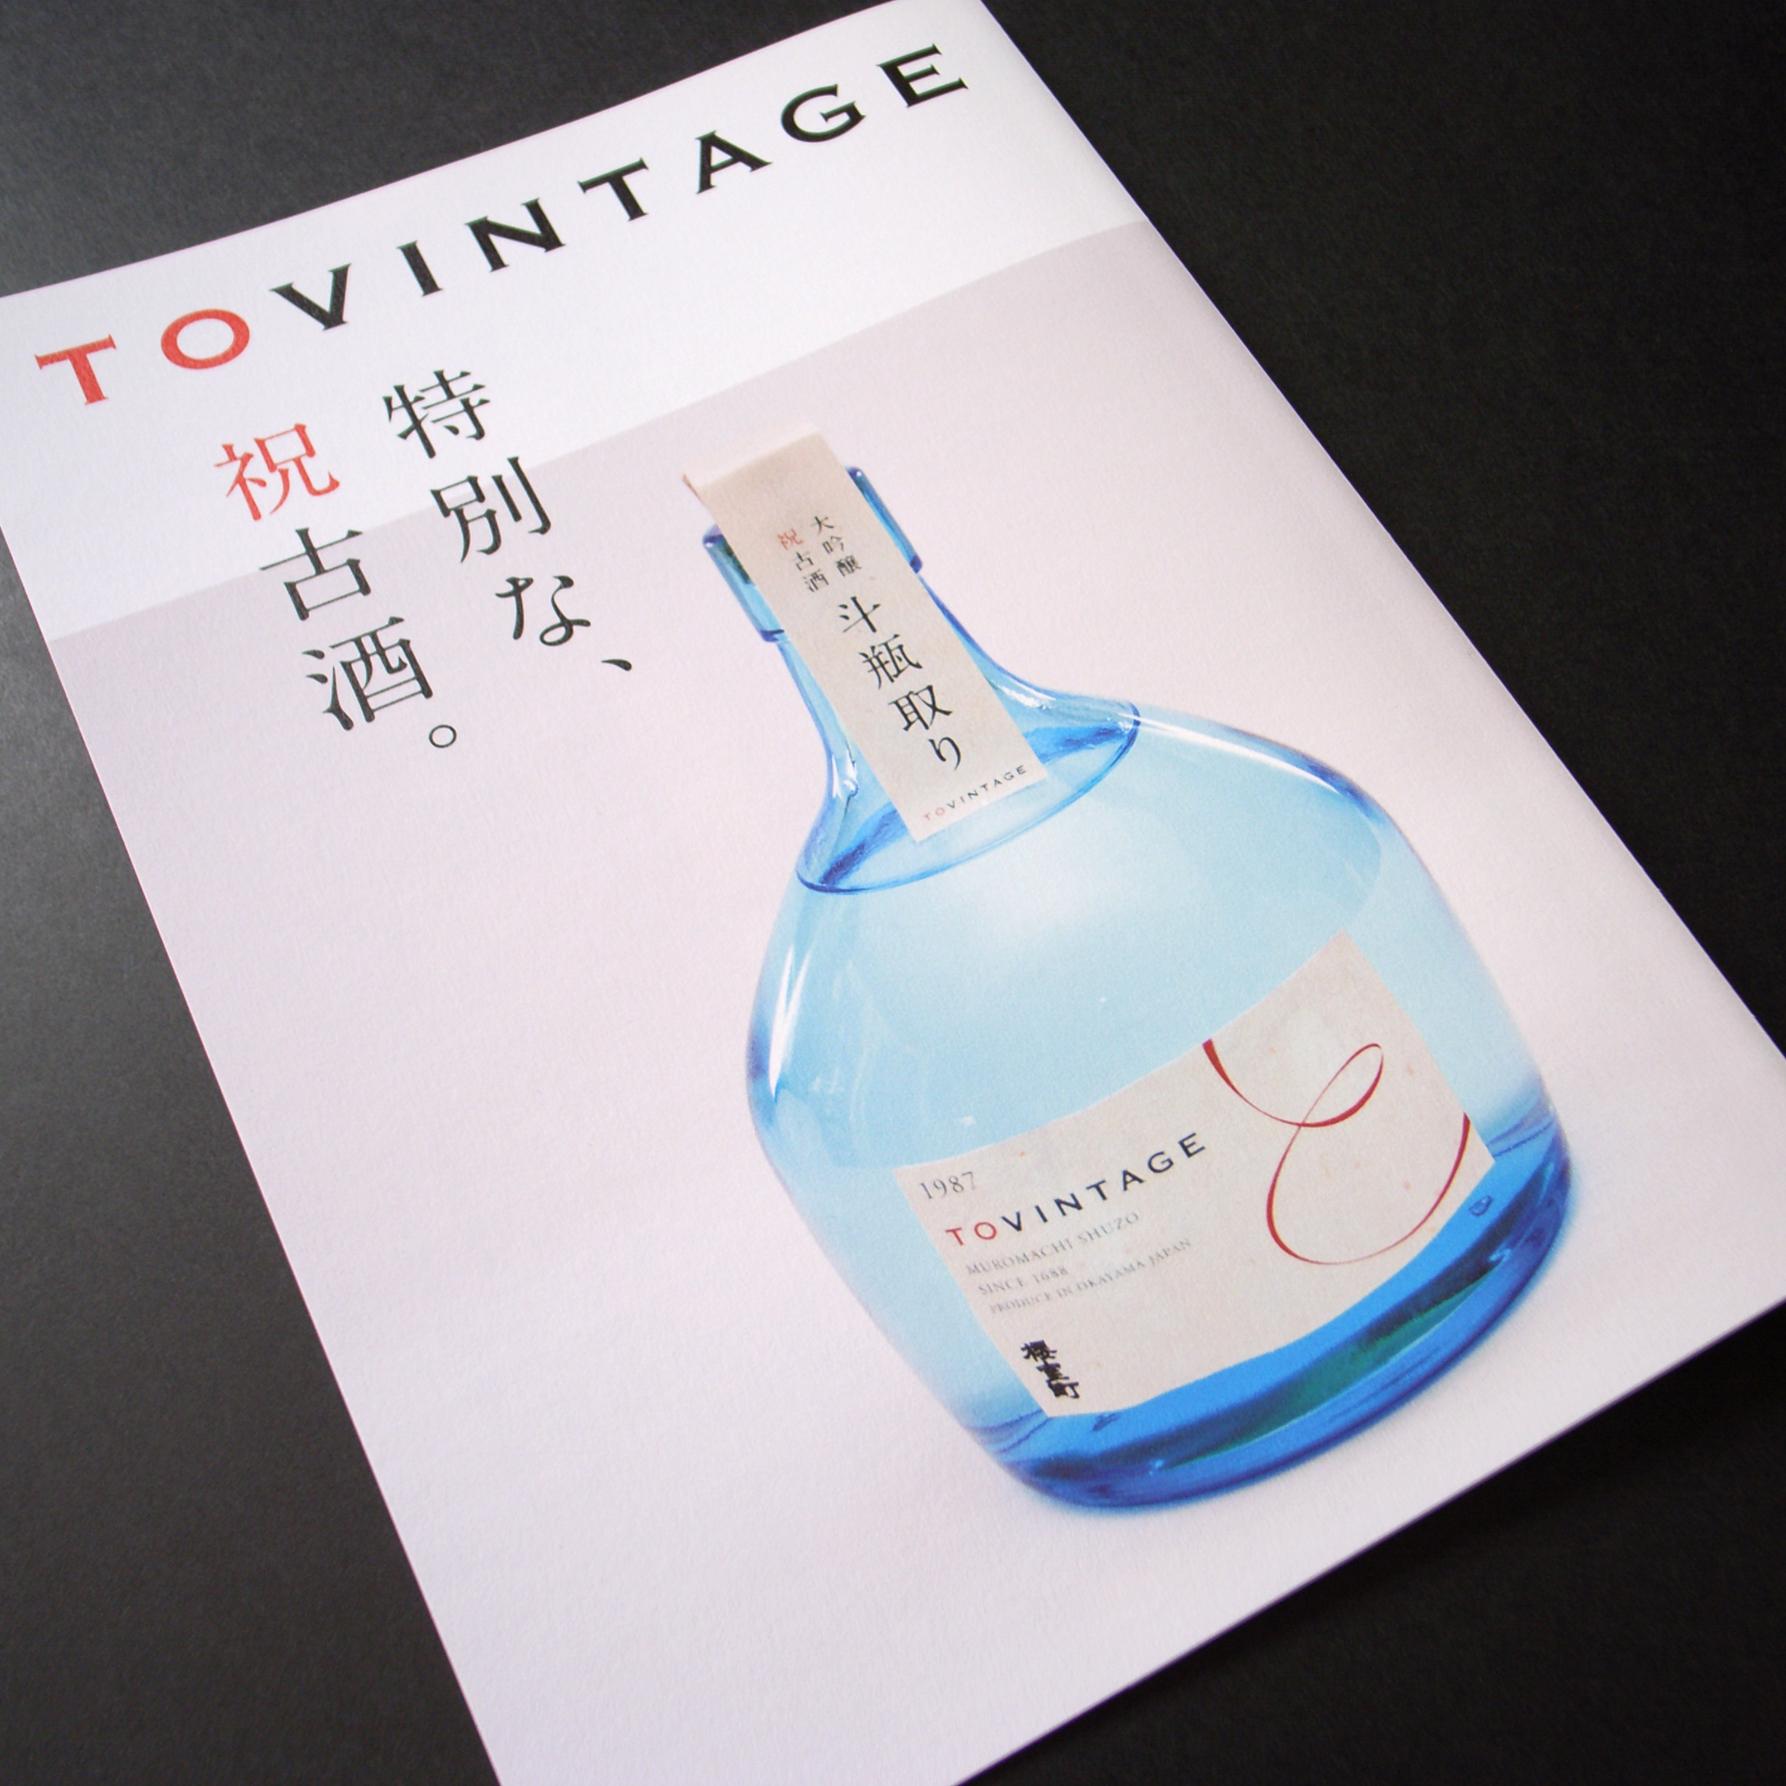 Tovintage_Leaflet_1